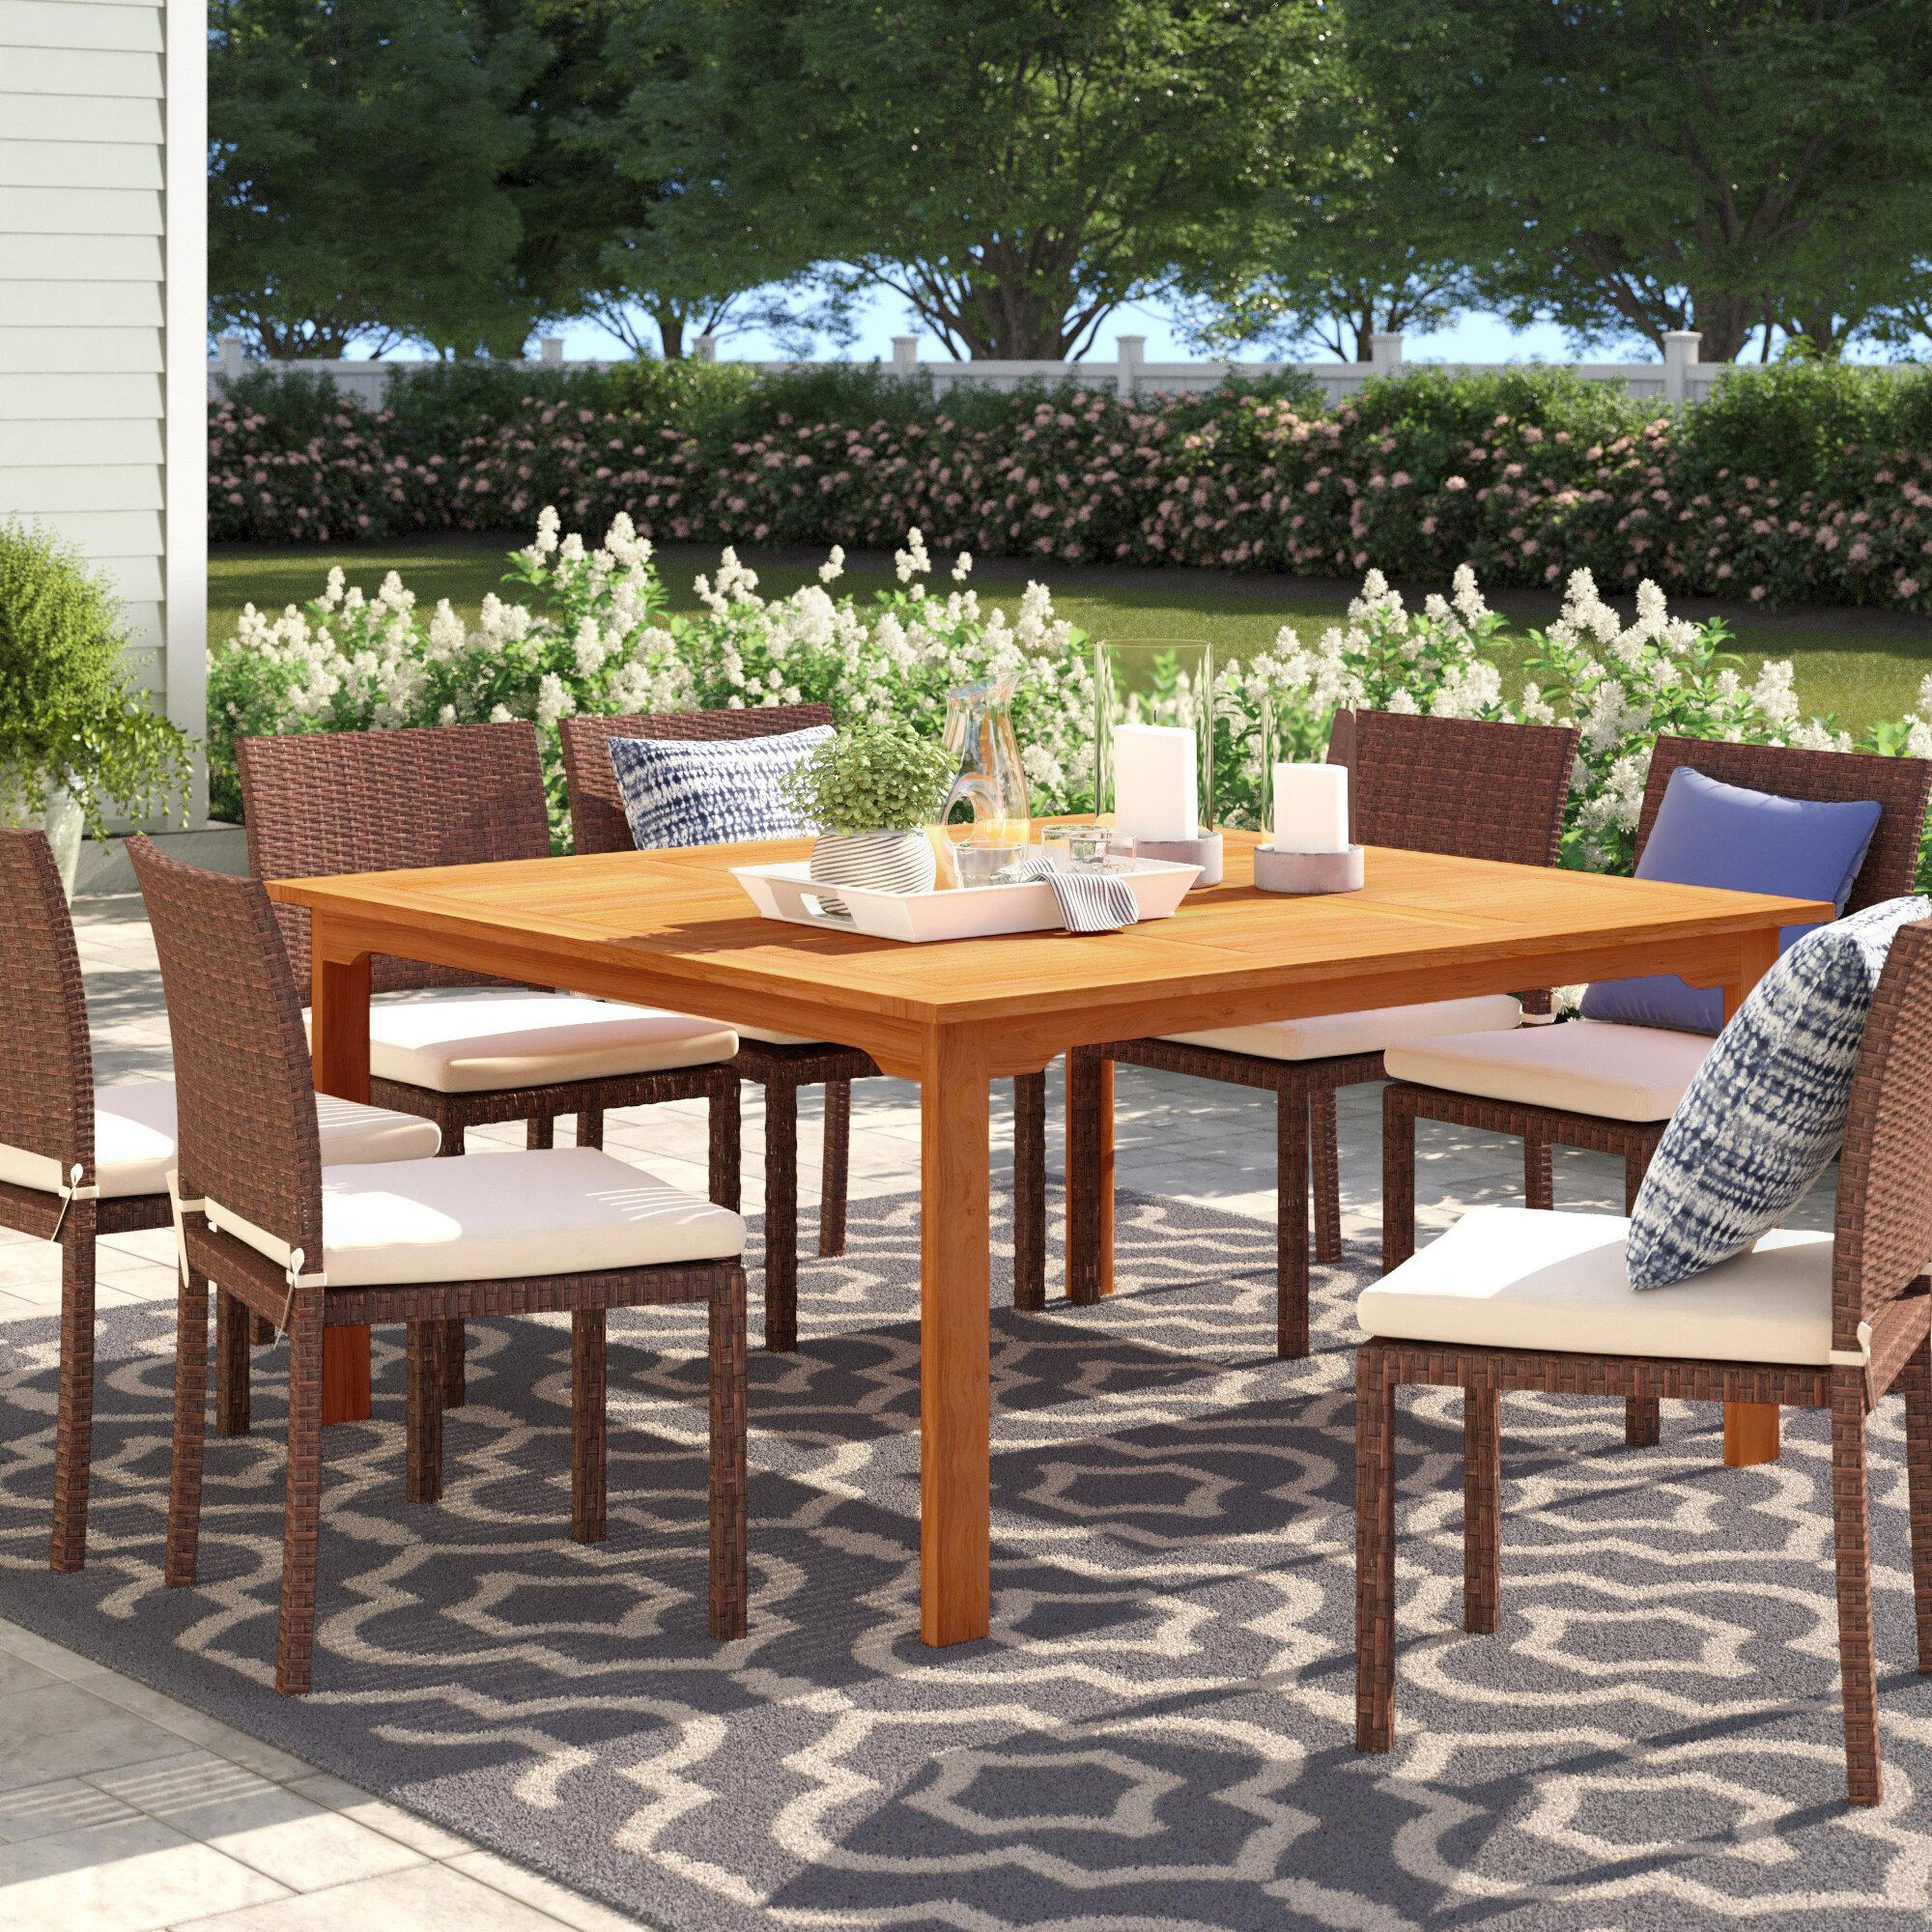 Brighton Patio Furniture.Brighton Solid Wood Dining Table